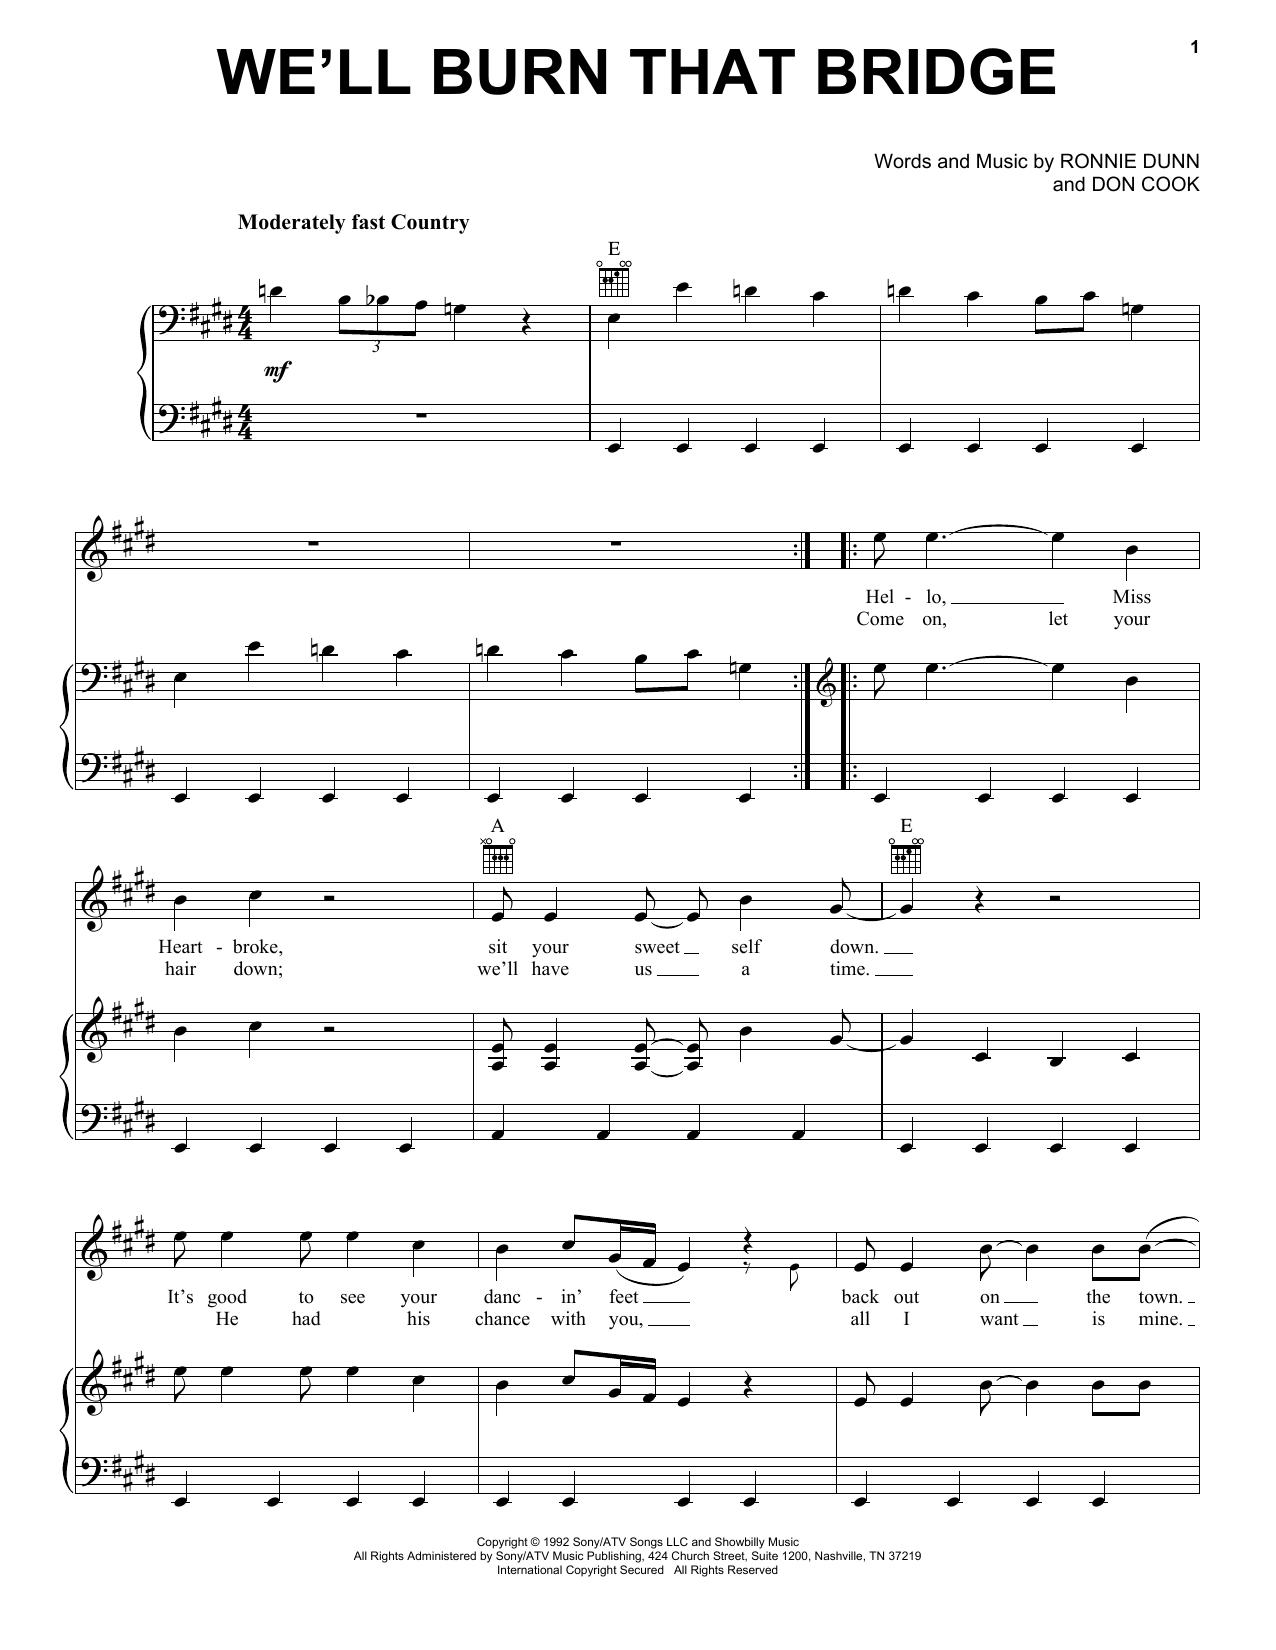 Brooks & Dunn We'll Burn That Bridge sheet music notes and chords. Download Printable PDF.